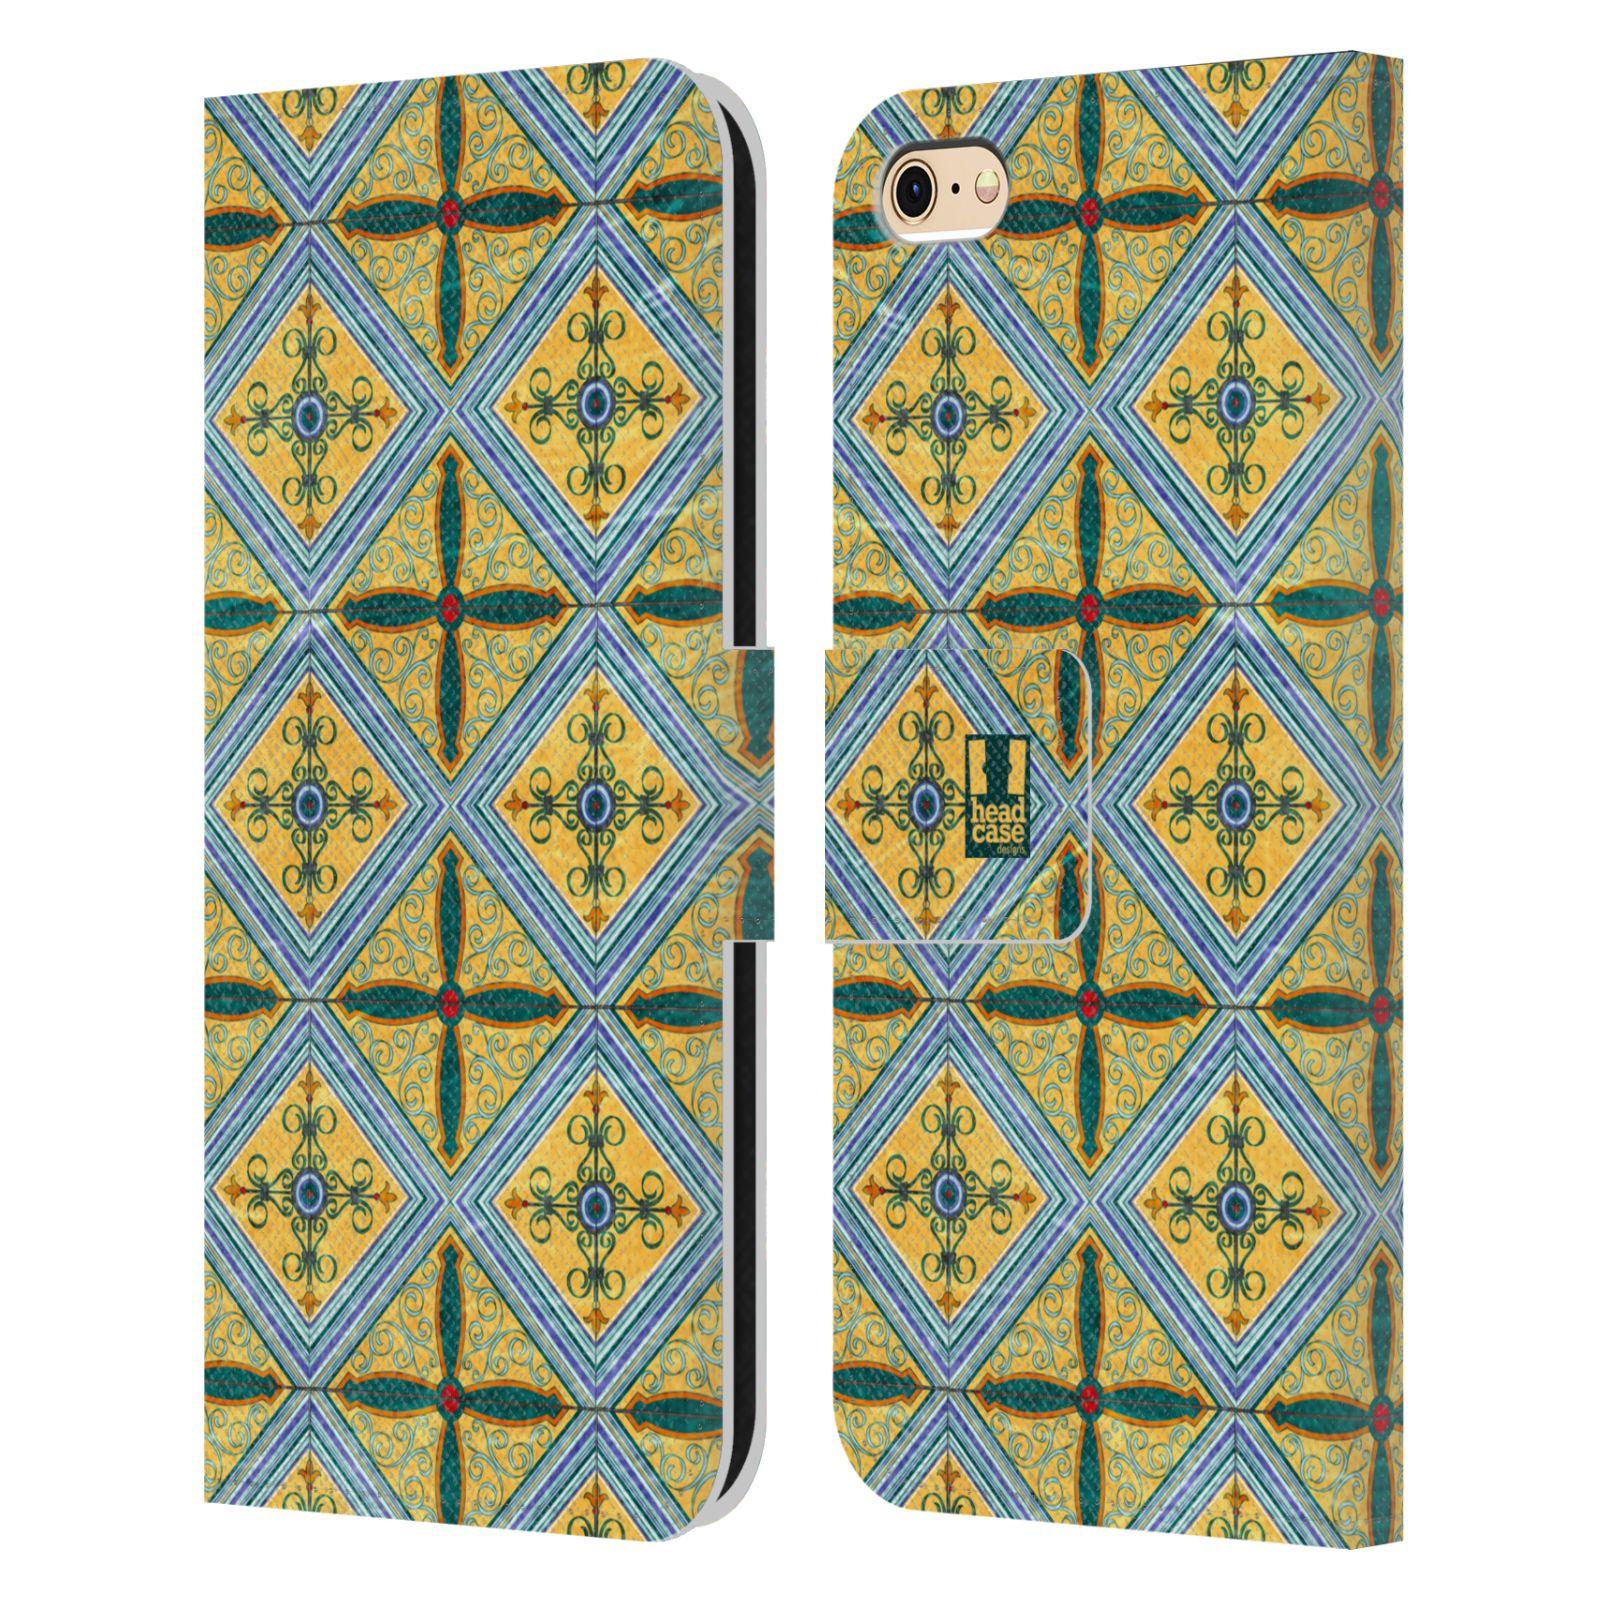 HEAD CASE Flipové pouzdro pro mobil Apple Iphone 6/6s ARABESKA CERAMIC žlutá